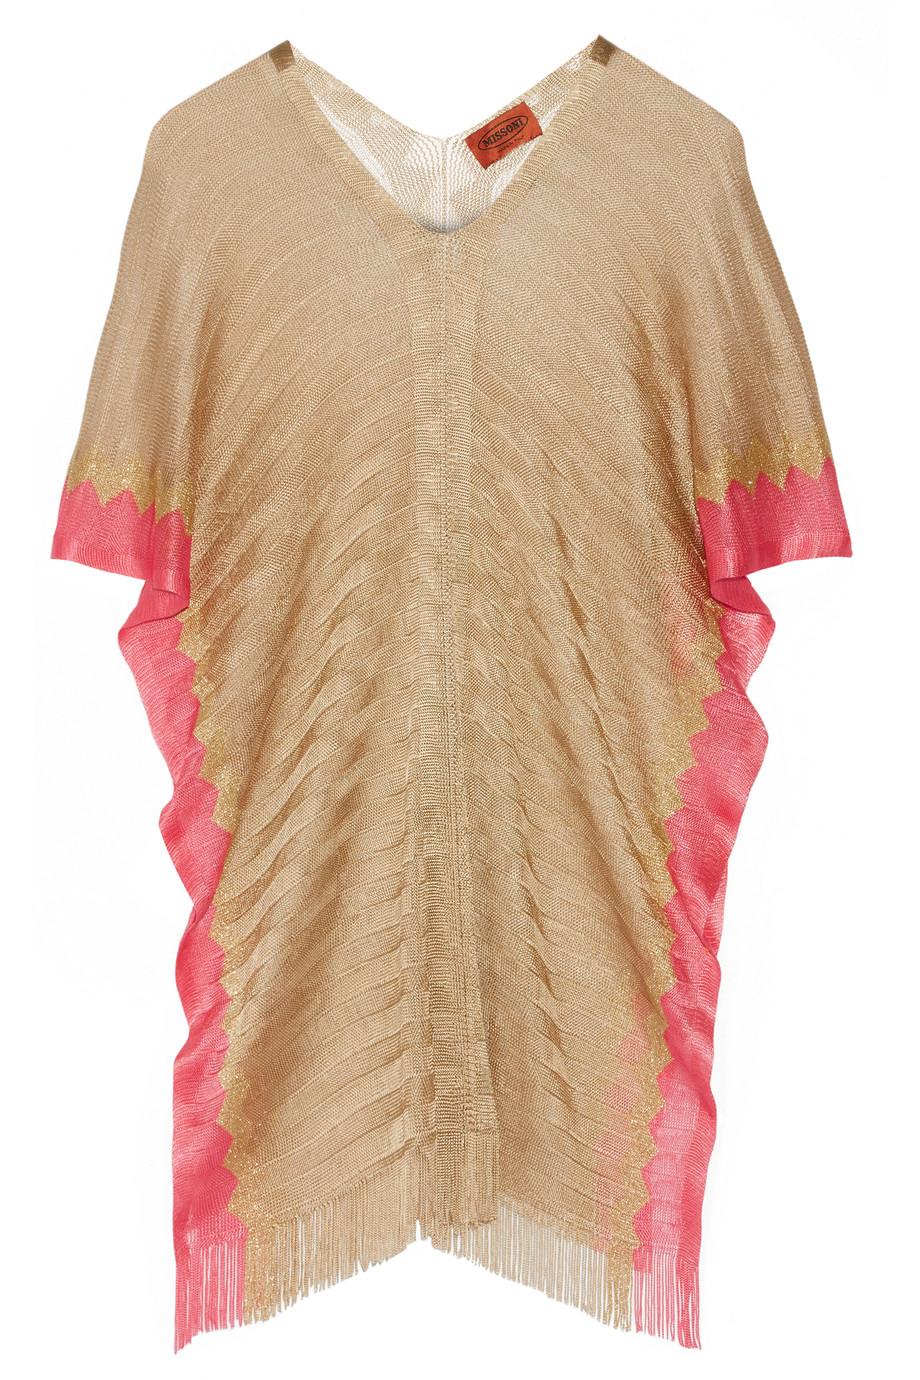 Missoni Fringed Two-Tone Crochet-Knit Kaftan, Gold, Women's